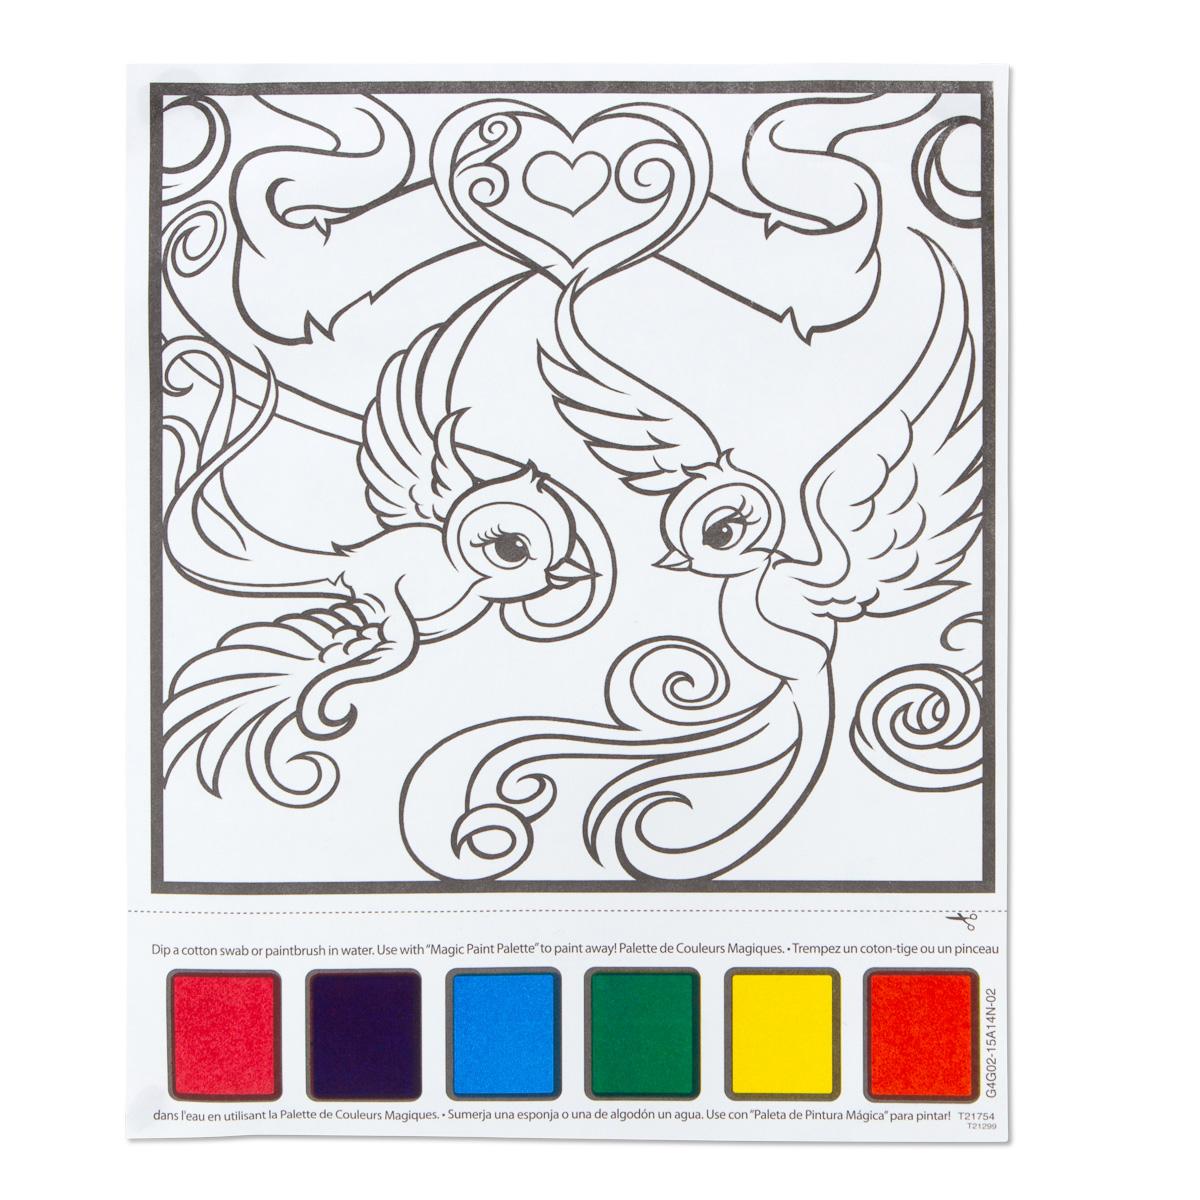 Savvi-Kids-Activity-Kit-Markers-Tattoos-Stickers-amp-More thumbnail 7